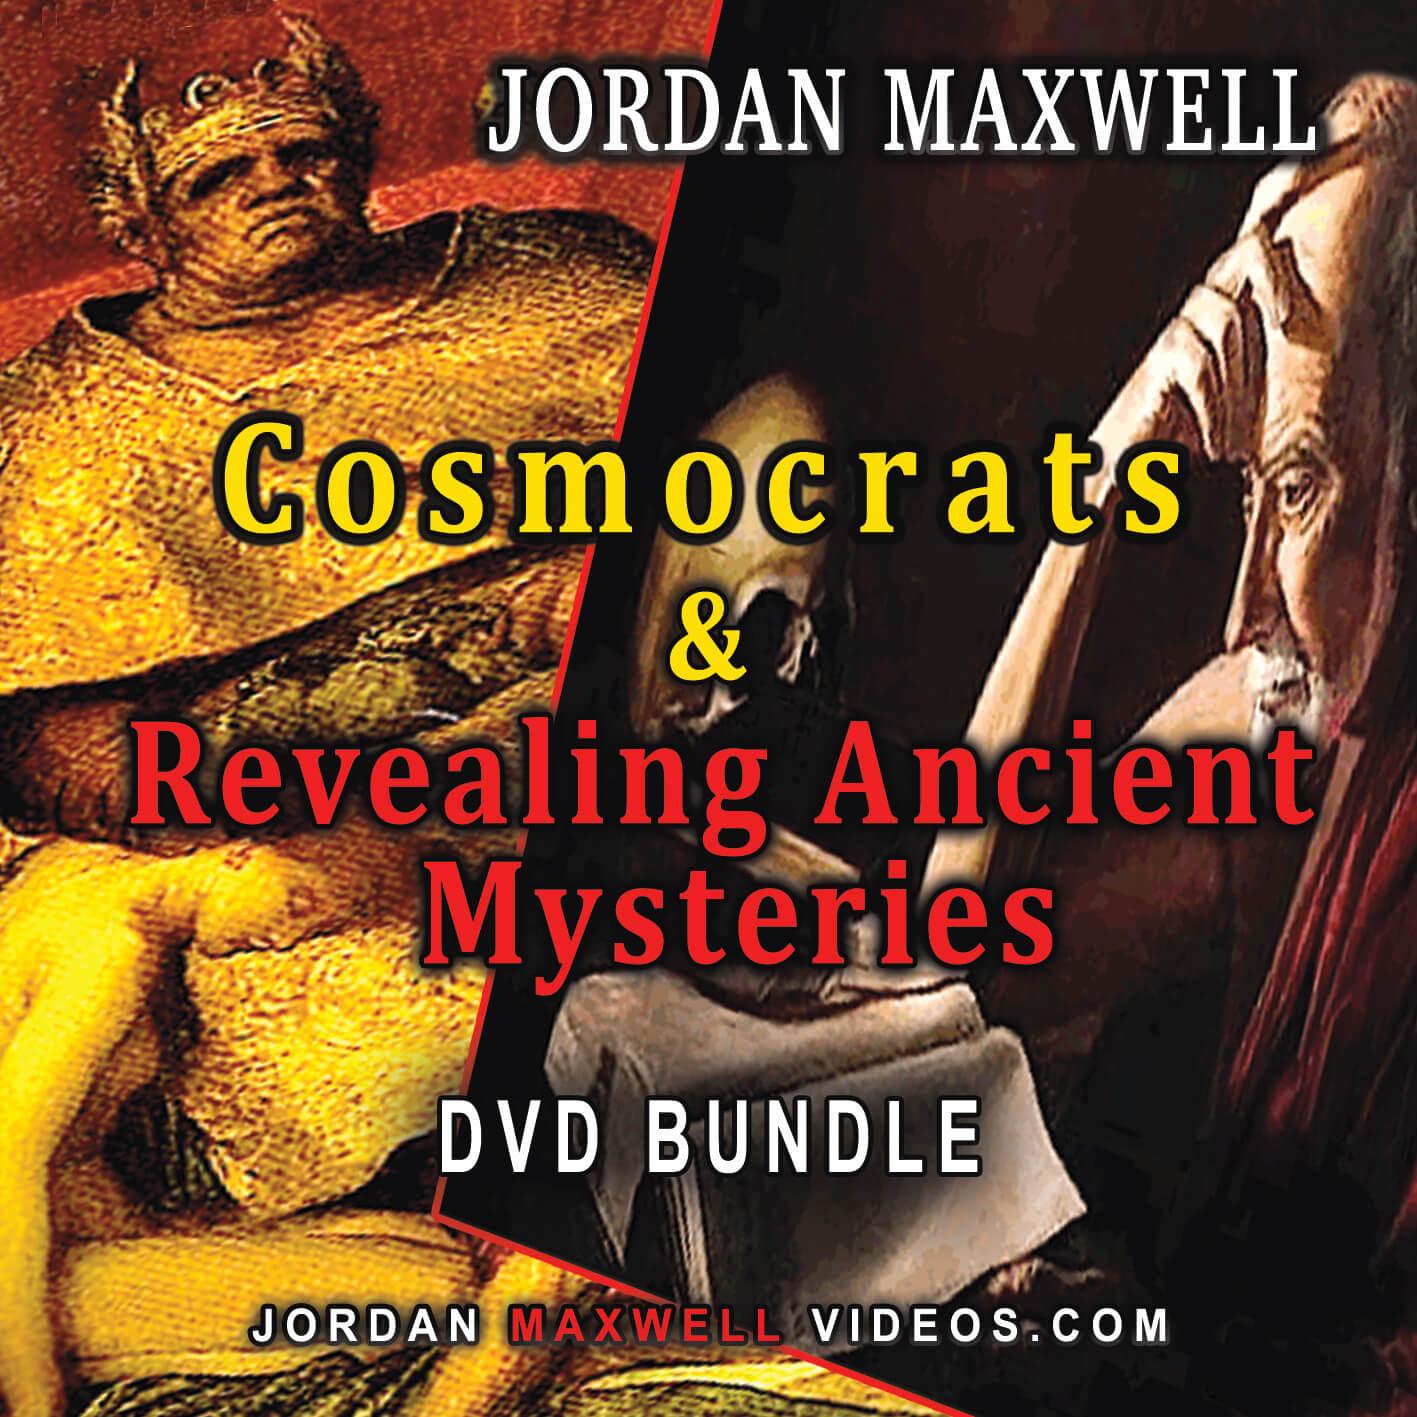 Jordan Maxwell Videos | jordan maxwell cosmocrats